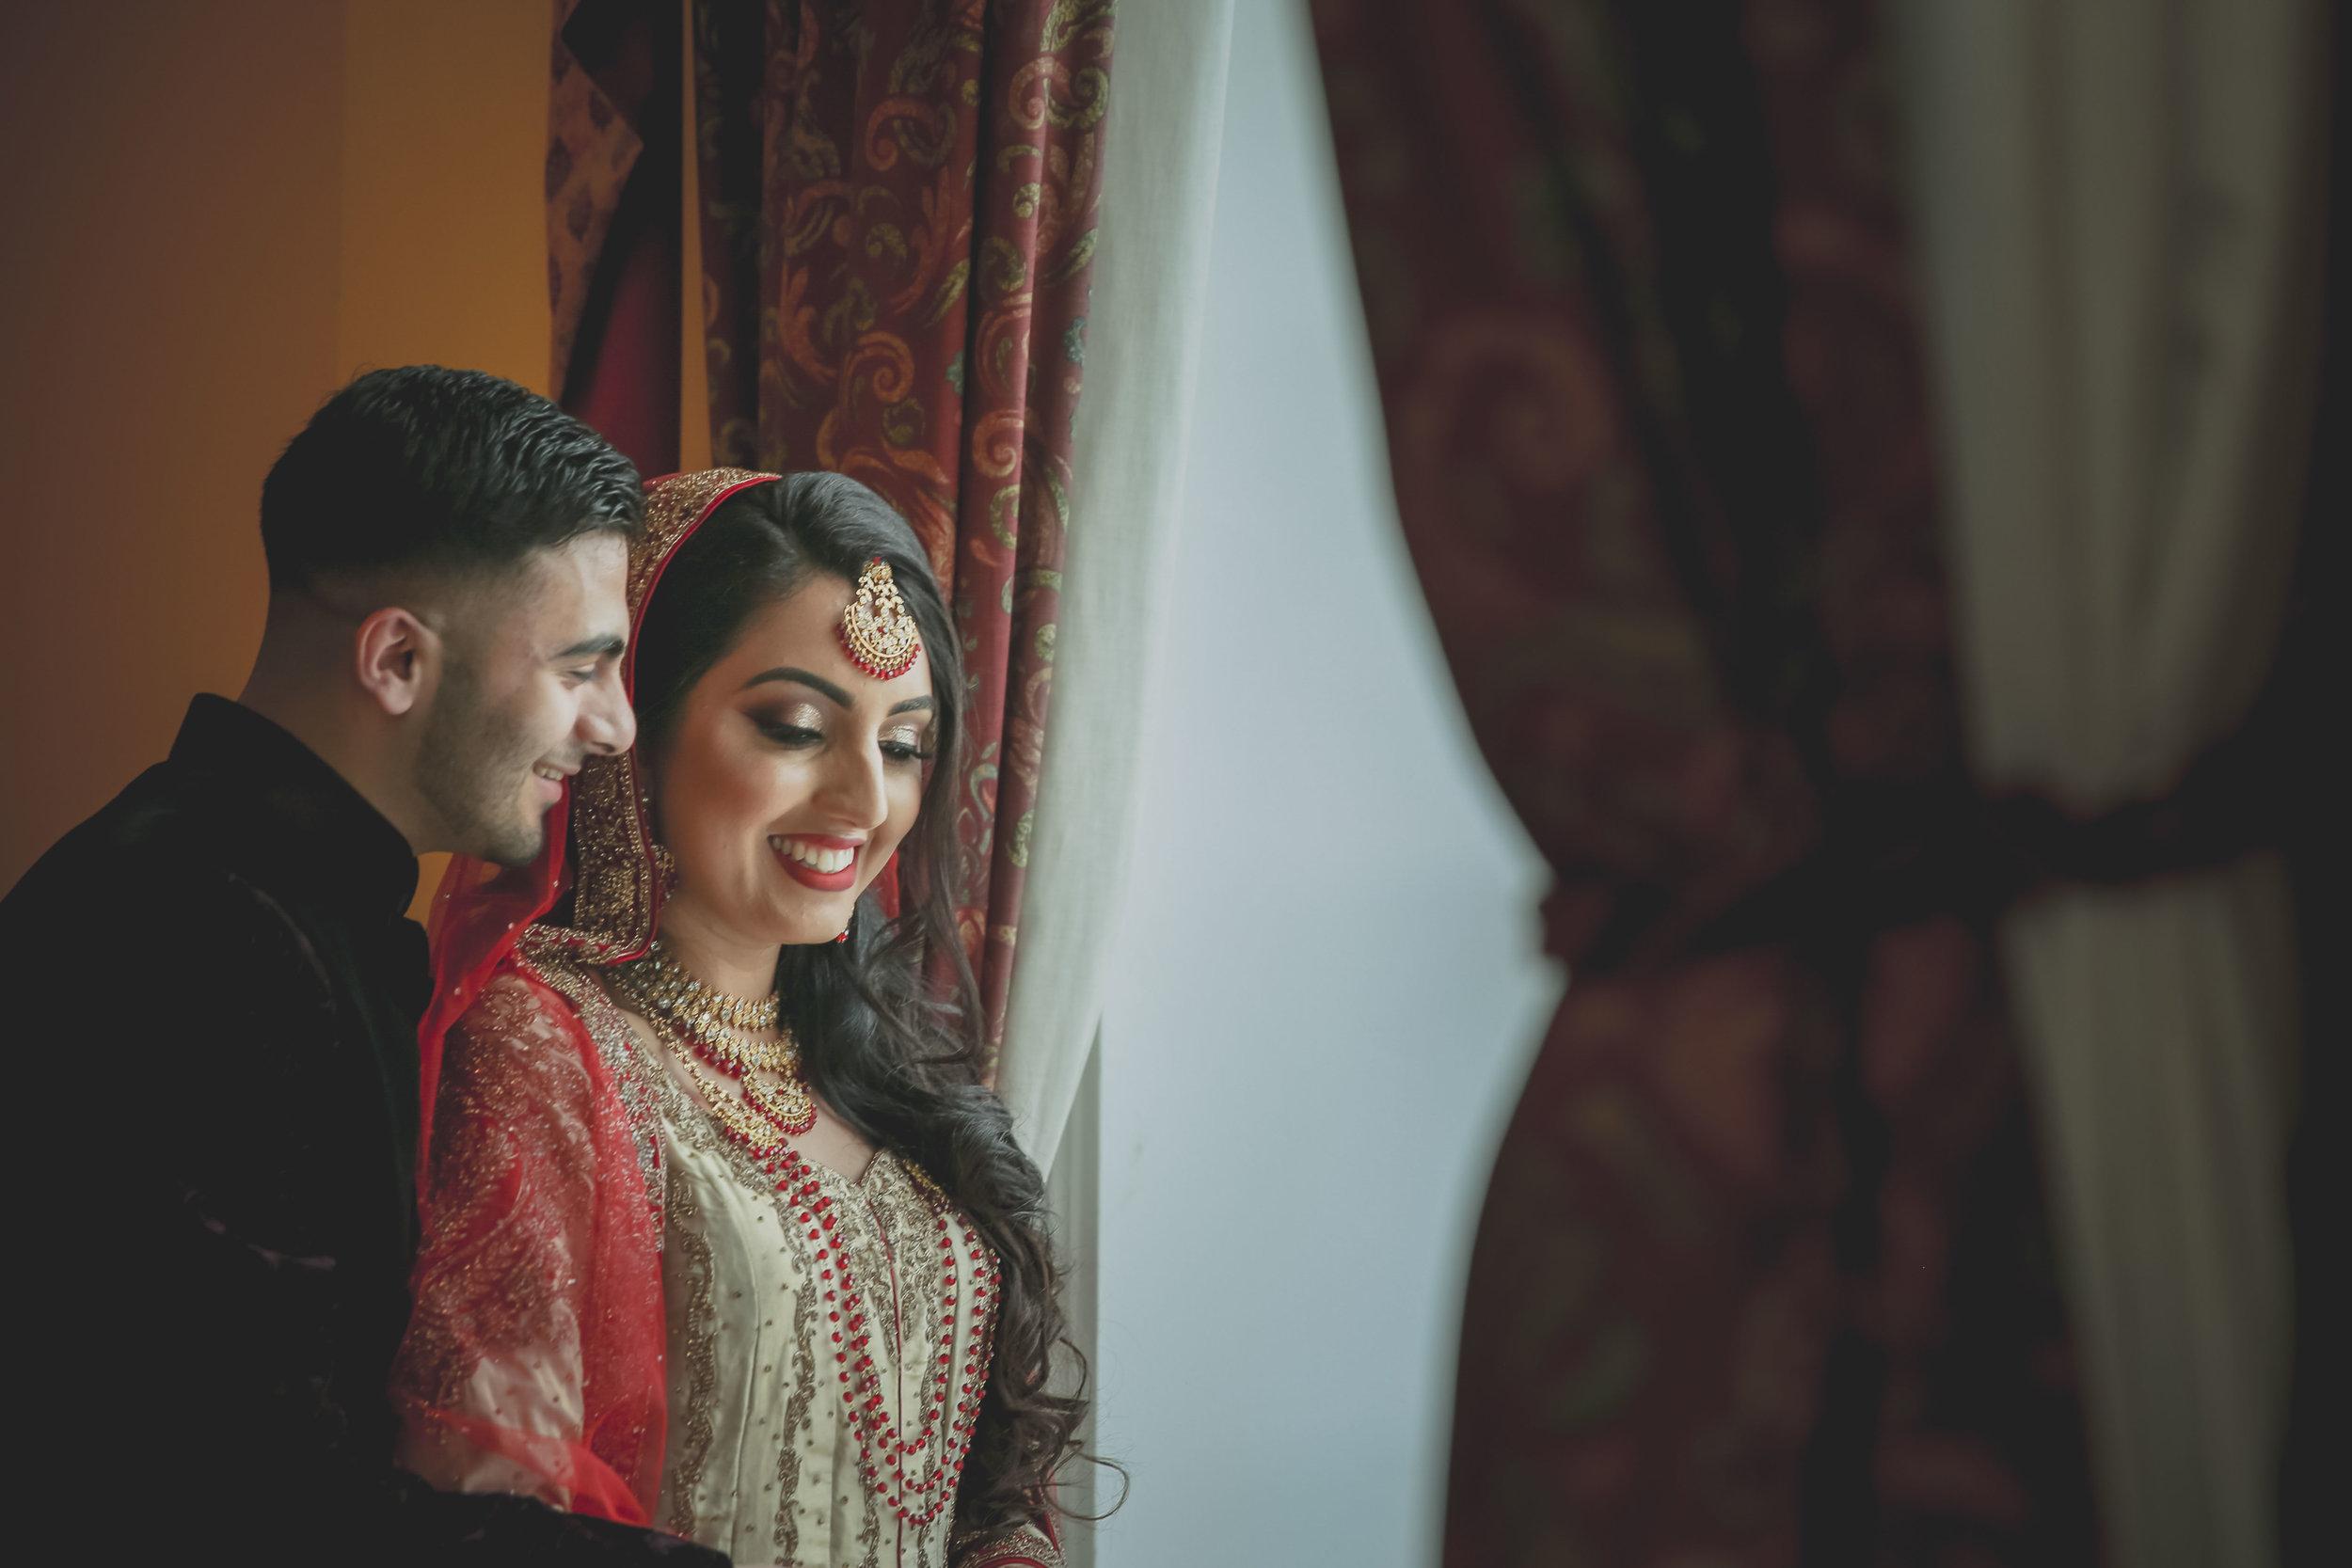 Female-asian-wedding-photographer-Cardiff-City-Hall-natalia-smith-photography-34.jpg